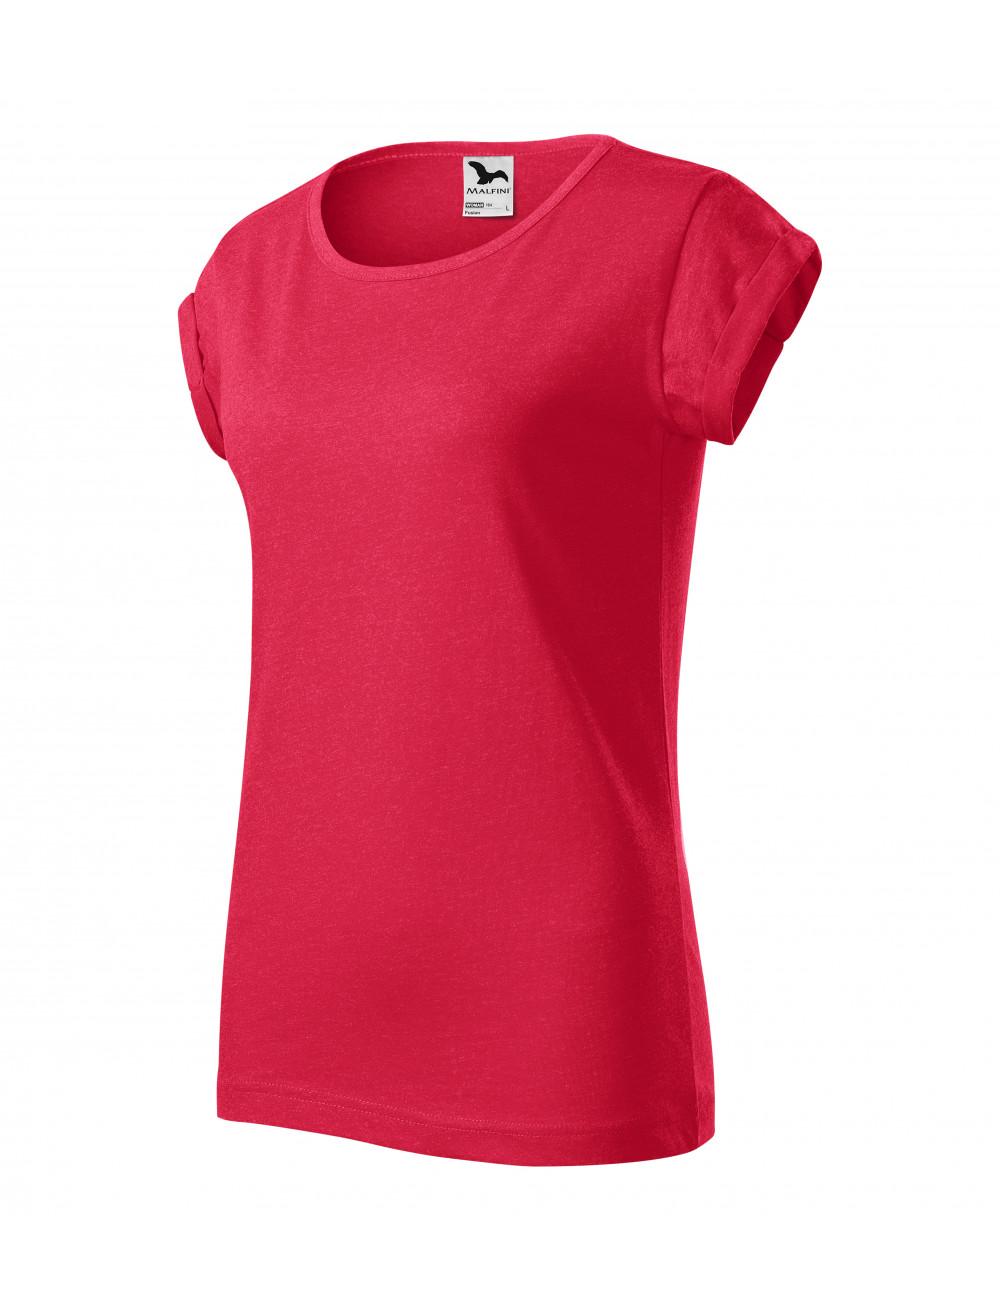 Adler MALFINI Koszulka damska Fusion 164 czerwony melanż